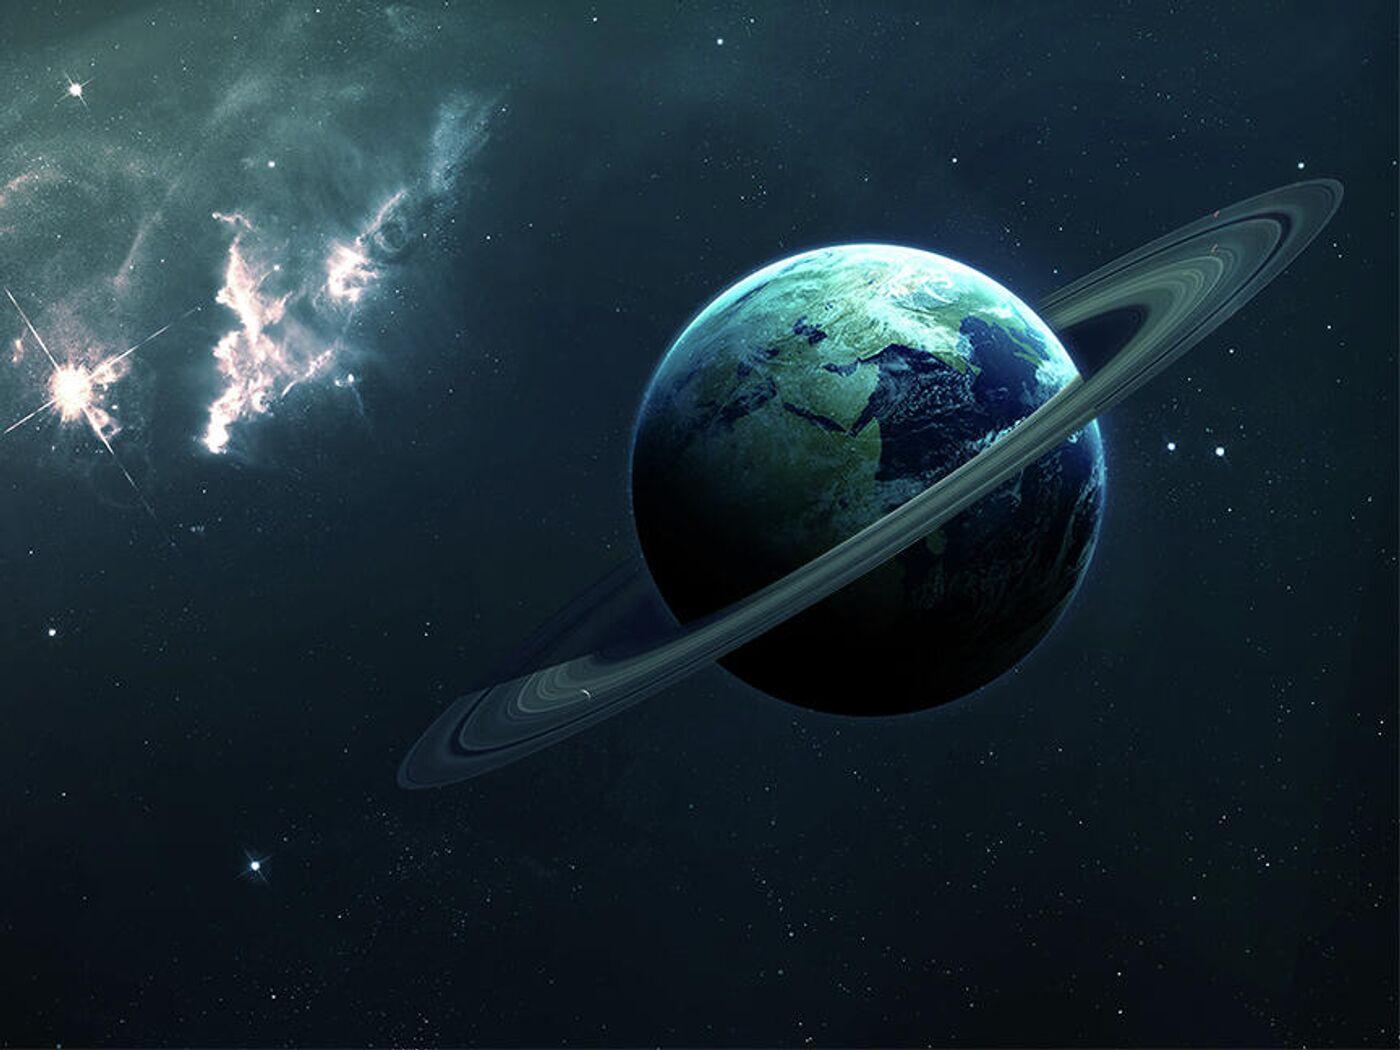 Обои обломки, астероиды, земля. Космос foto 16